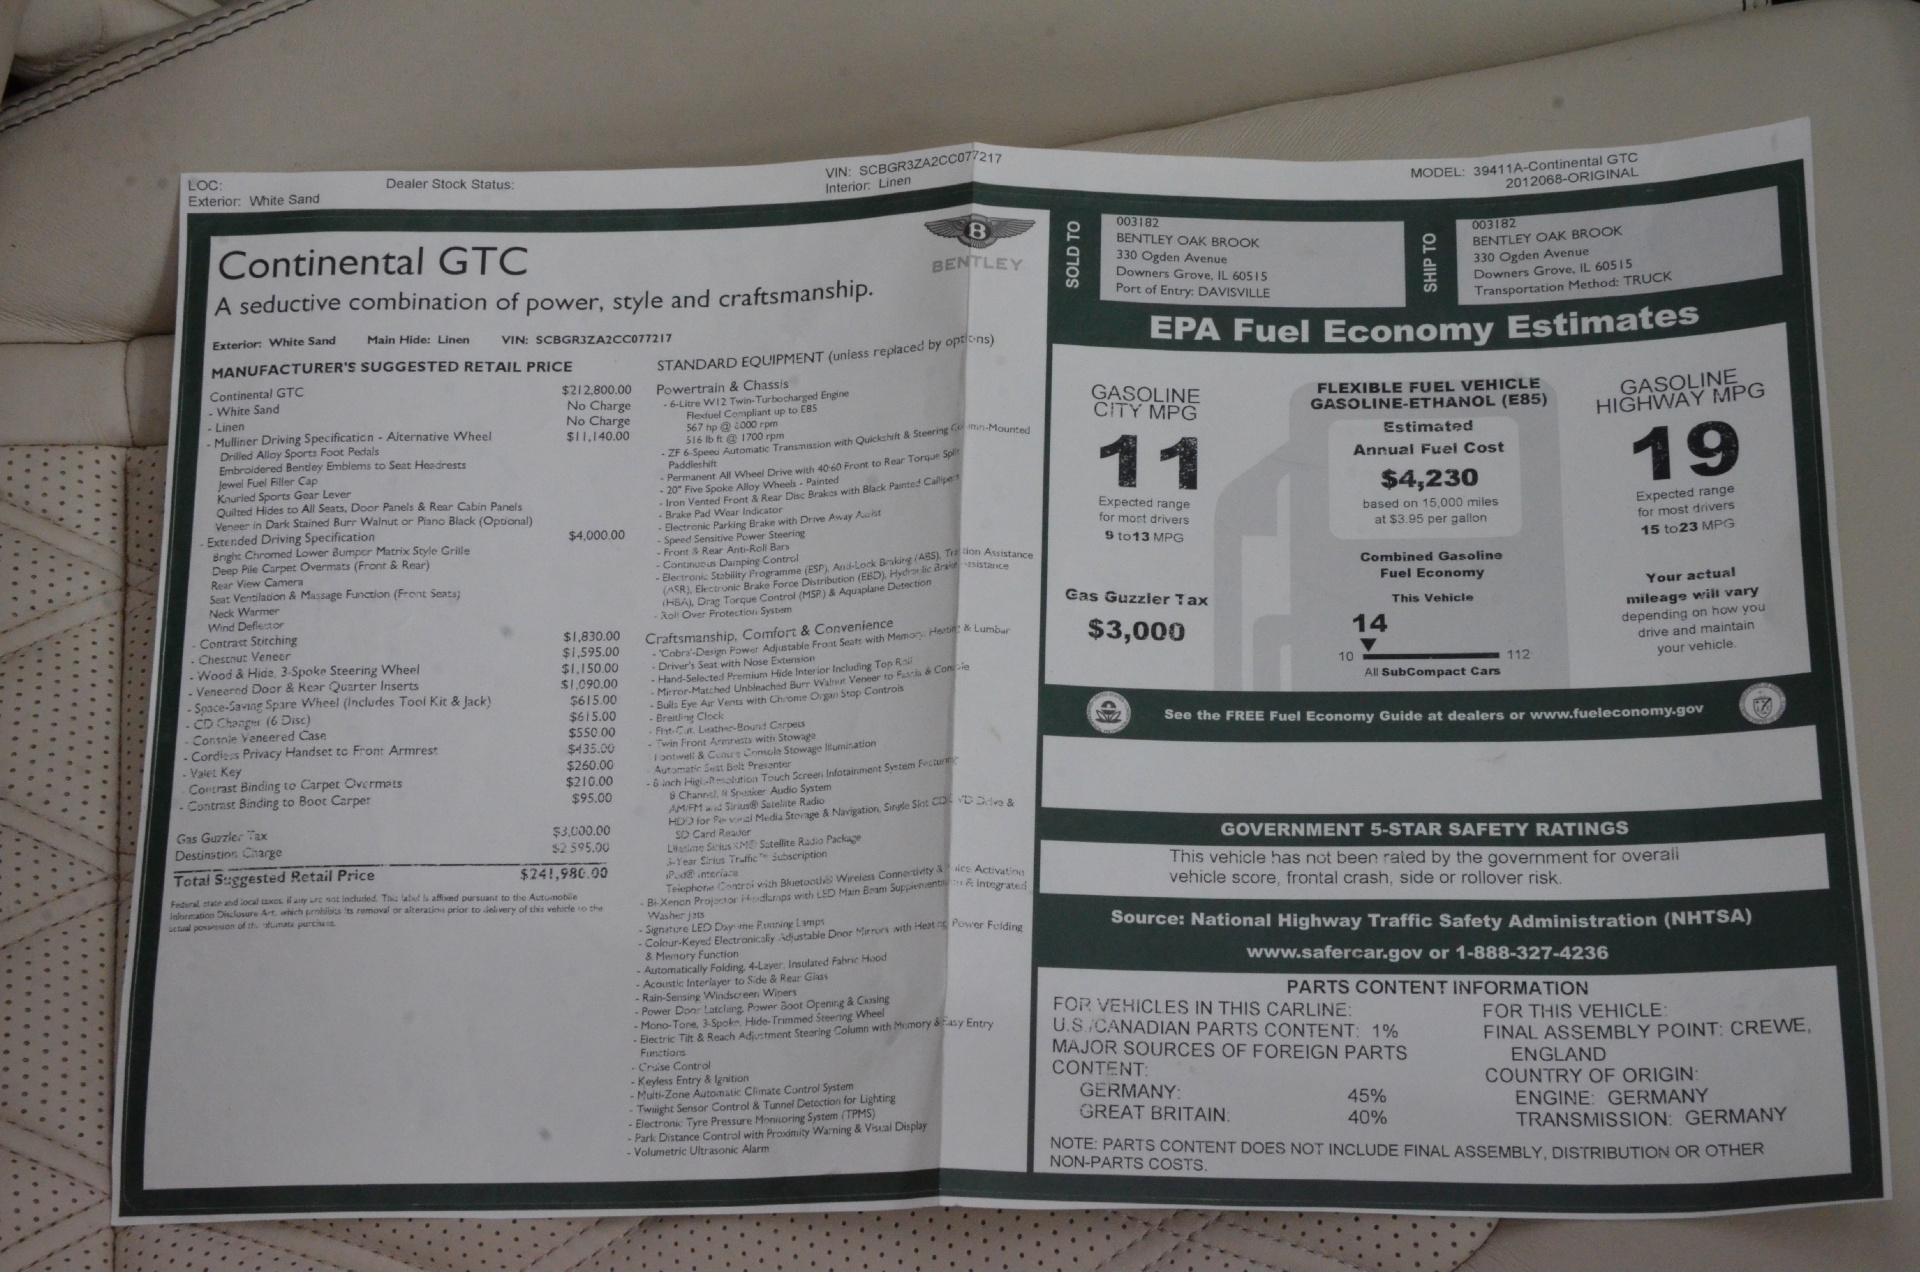 bentley continental gt manual pdf